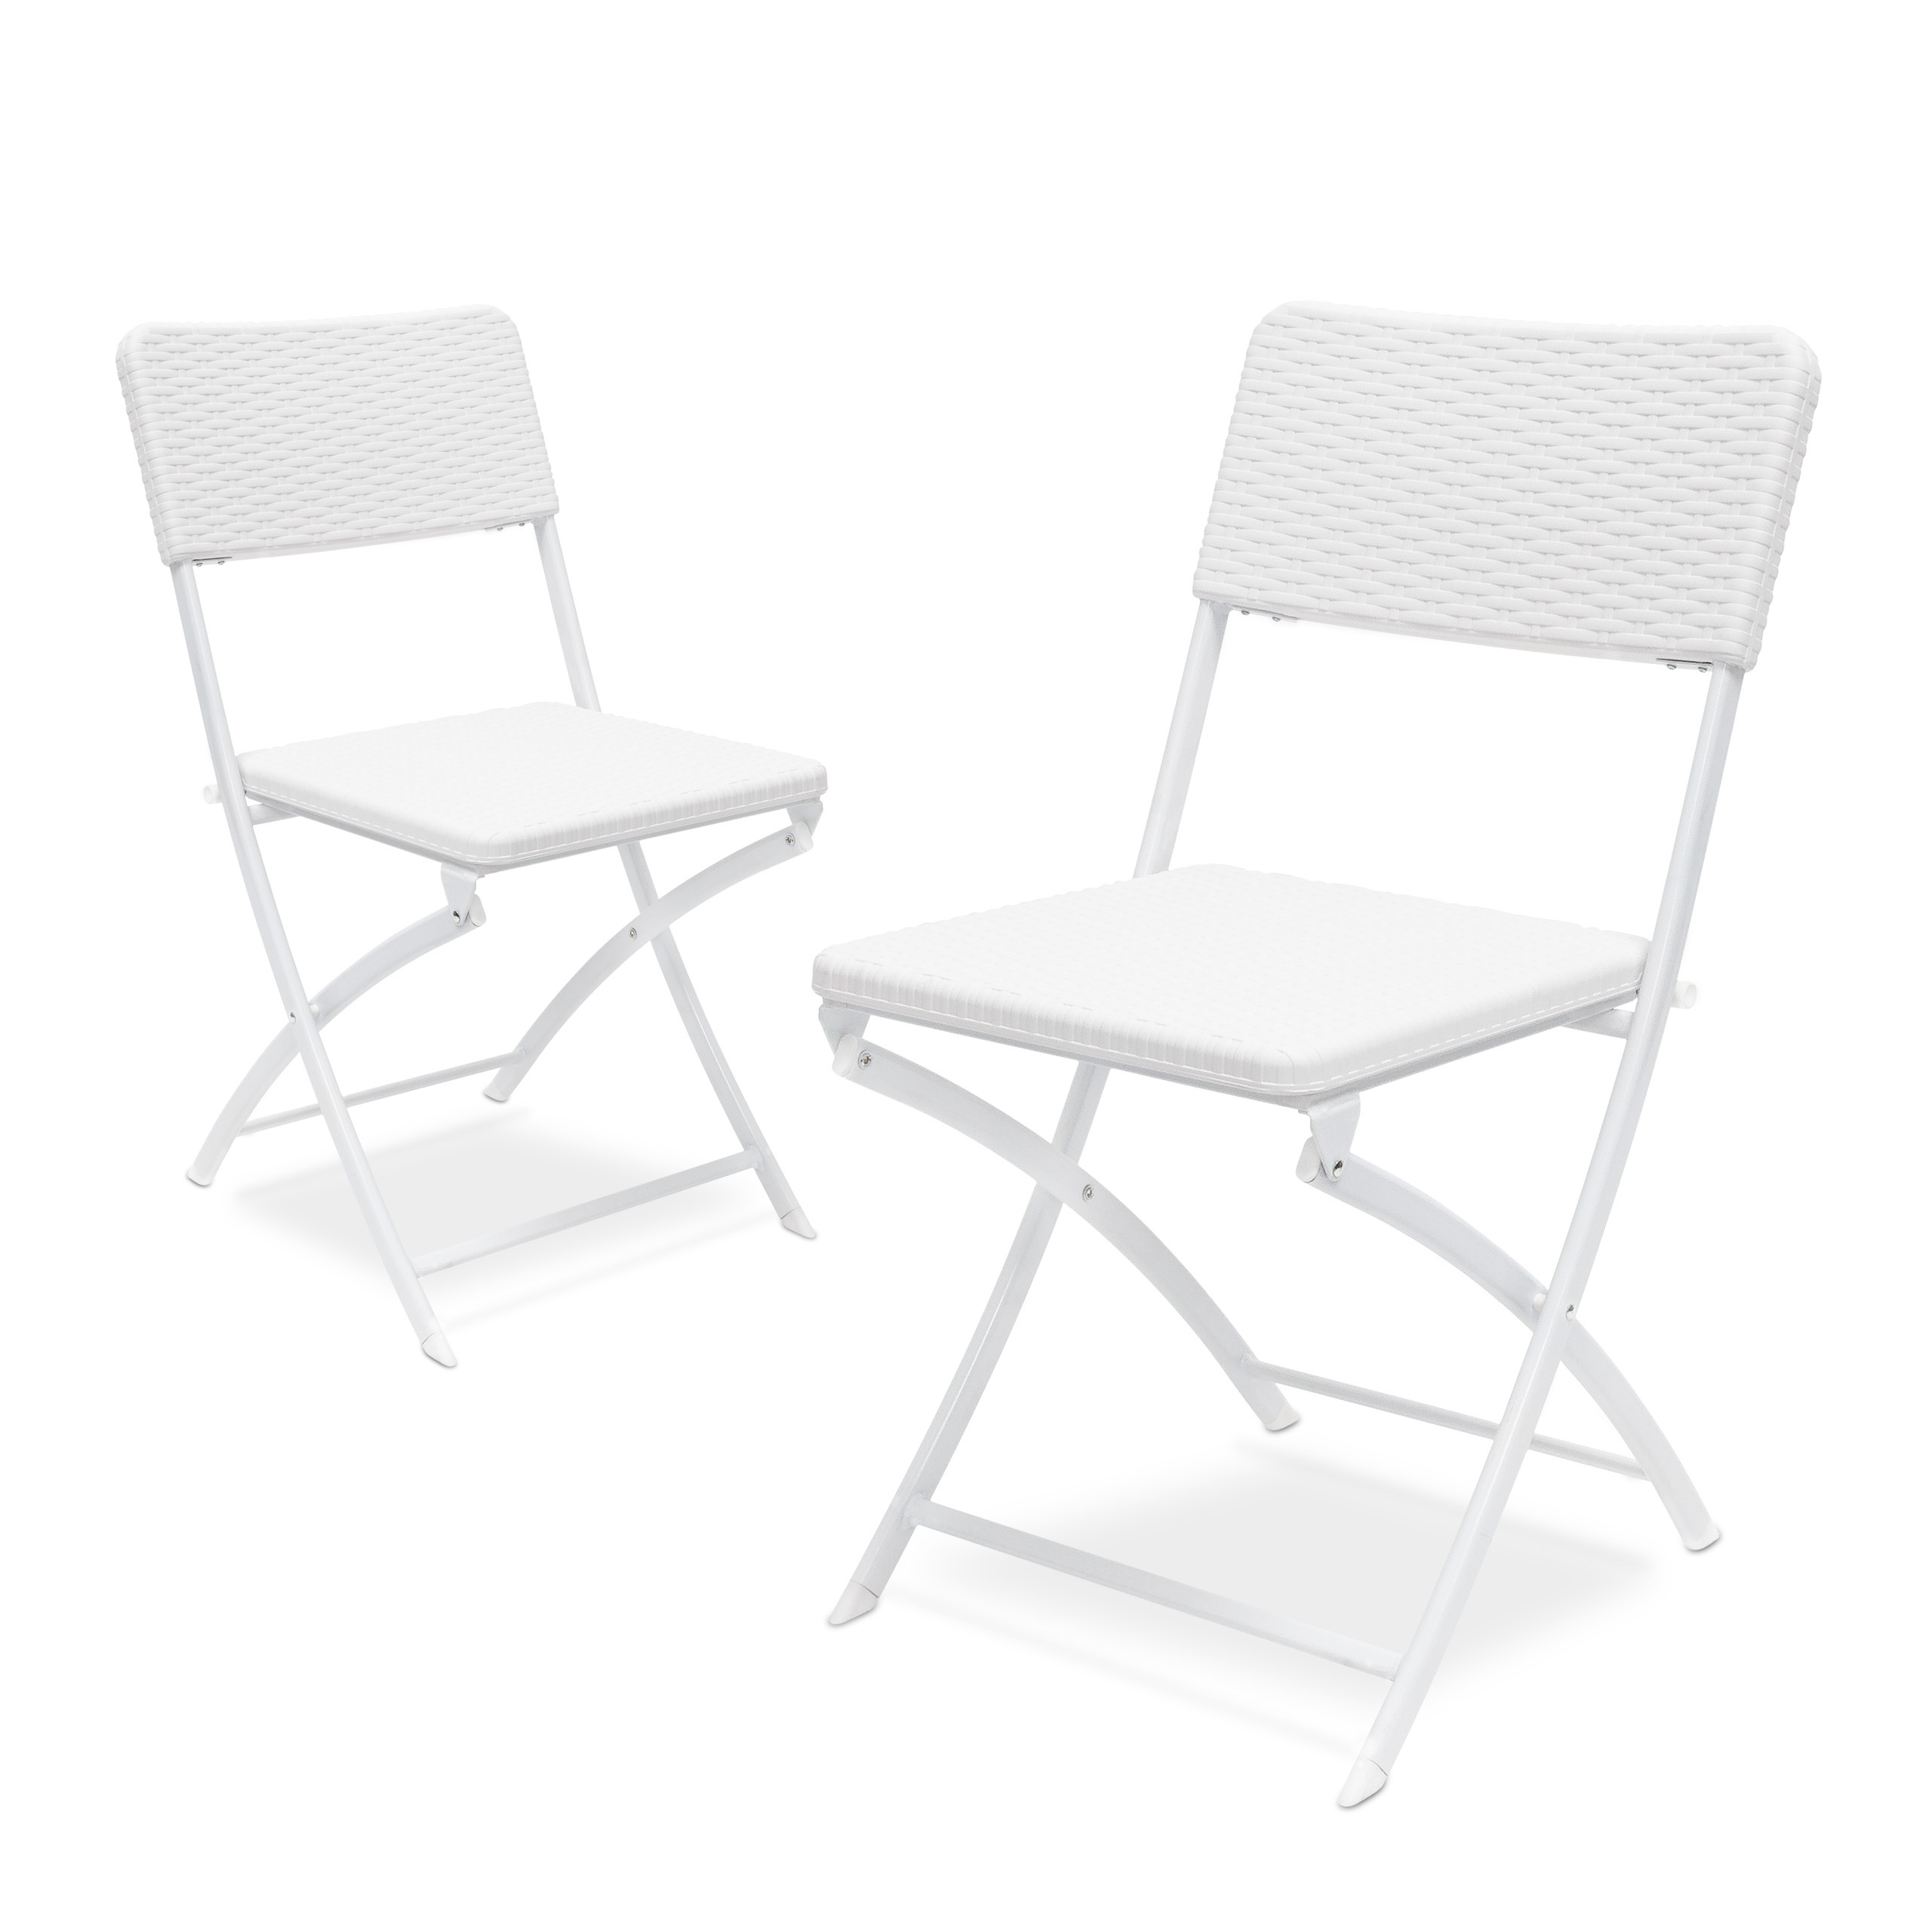 Klappstuhl-BASTIAN-Gartenstuhl-klappbar-Campingstuhl-Sitzgarnitur-Set-Rattan